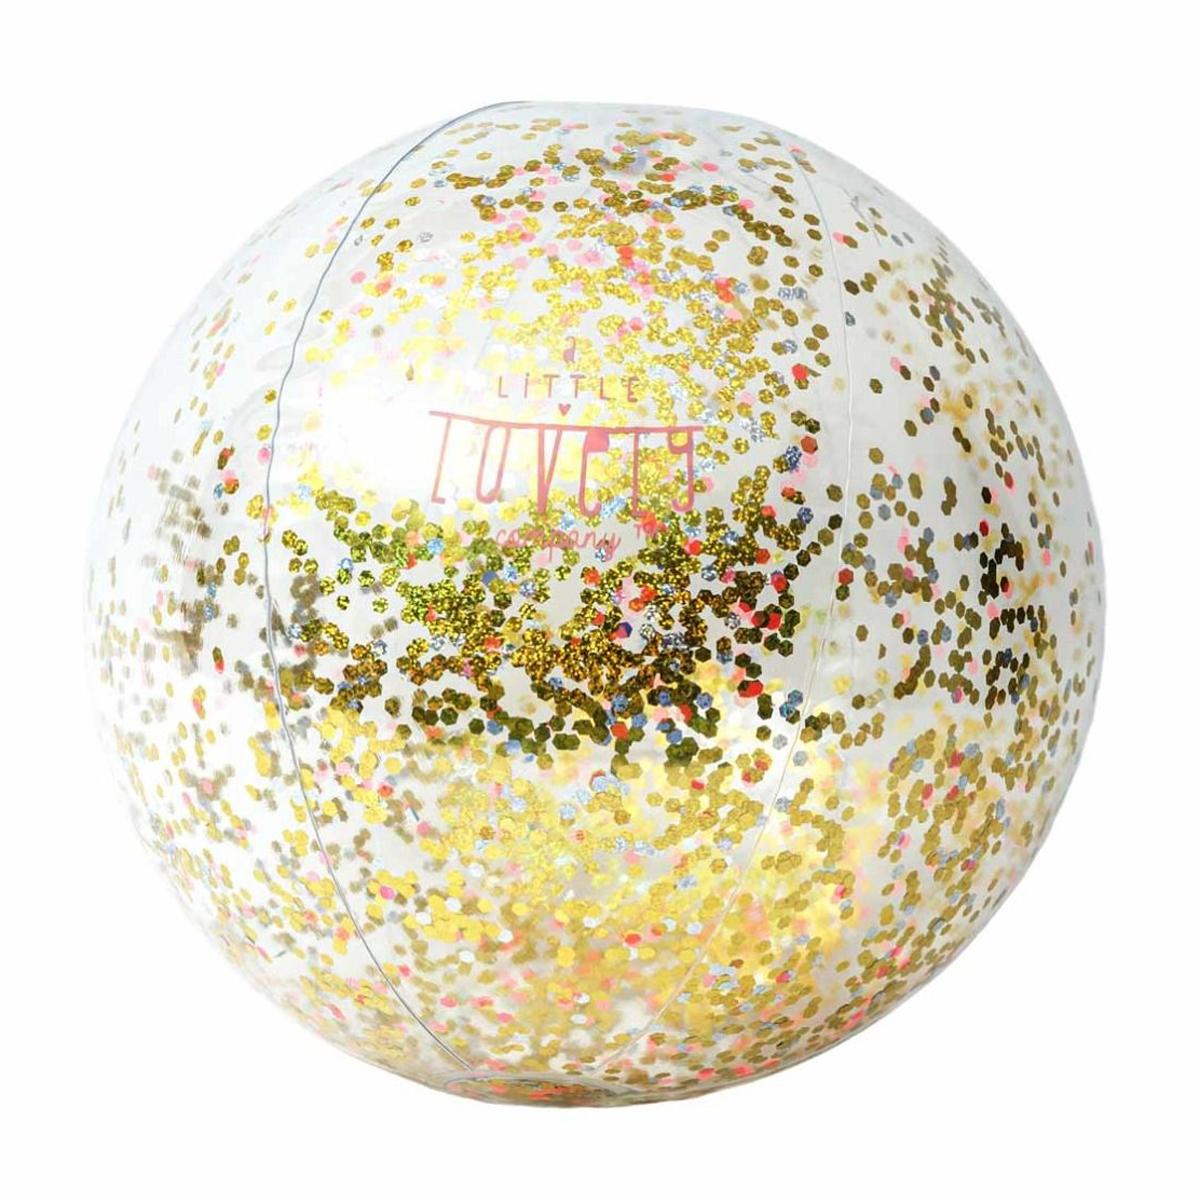 Image of A Little Lovely Company badebold med glitter